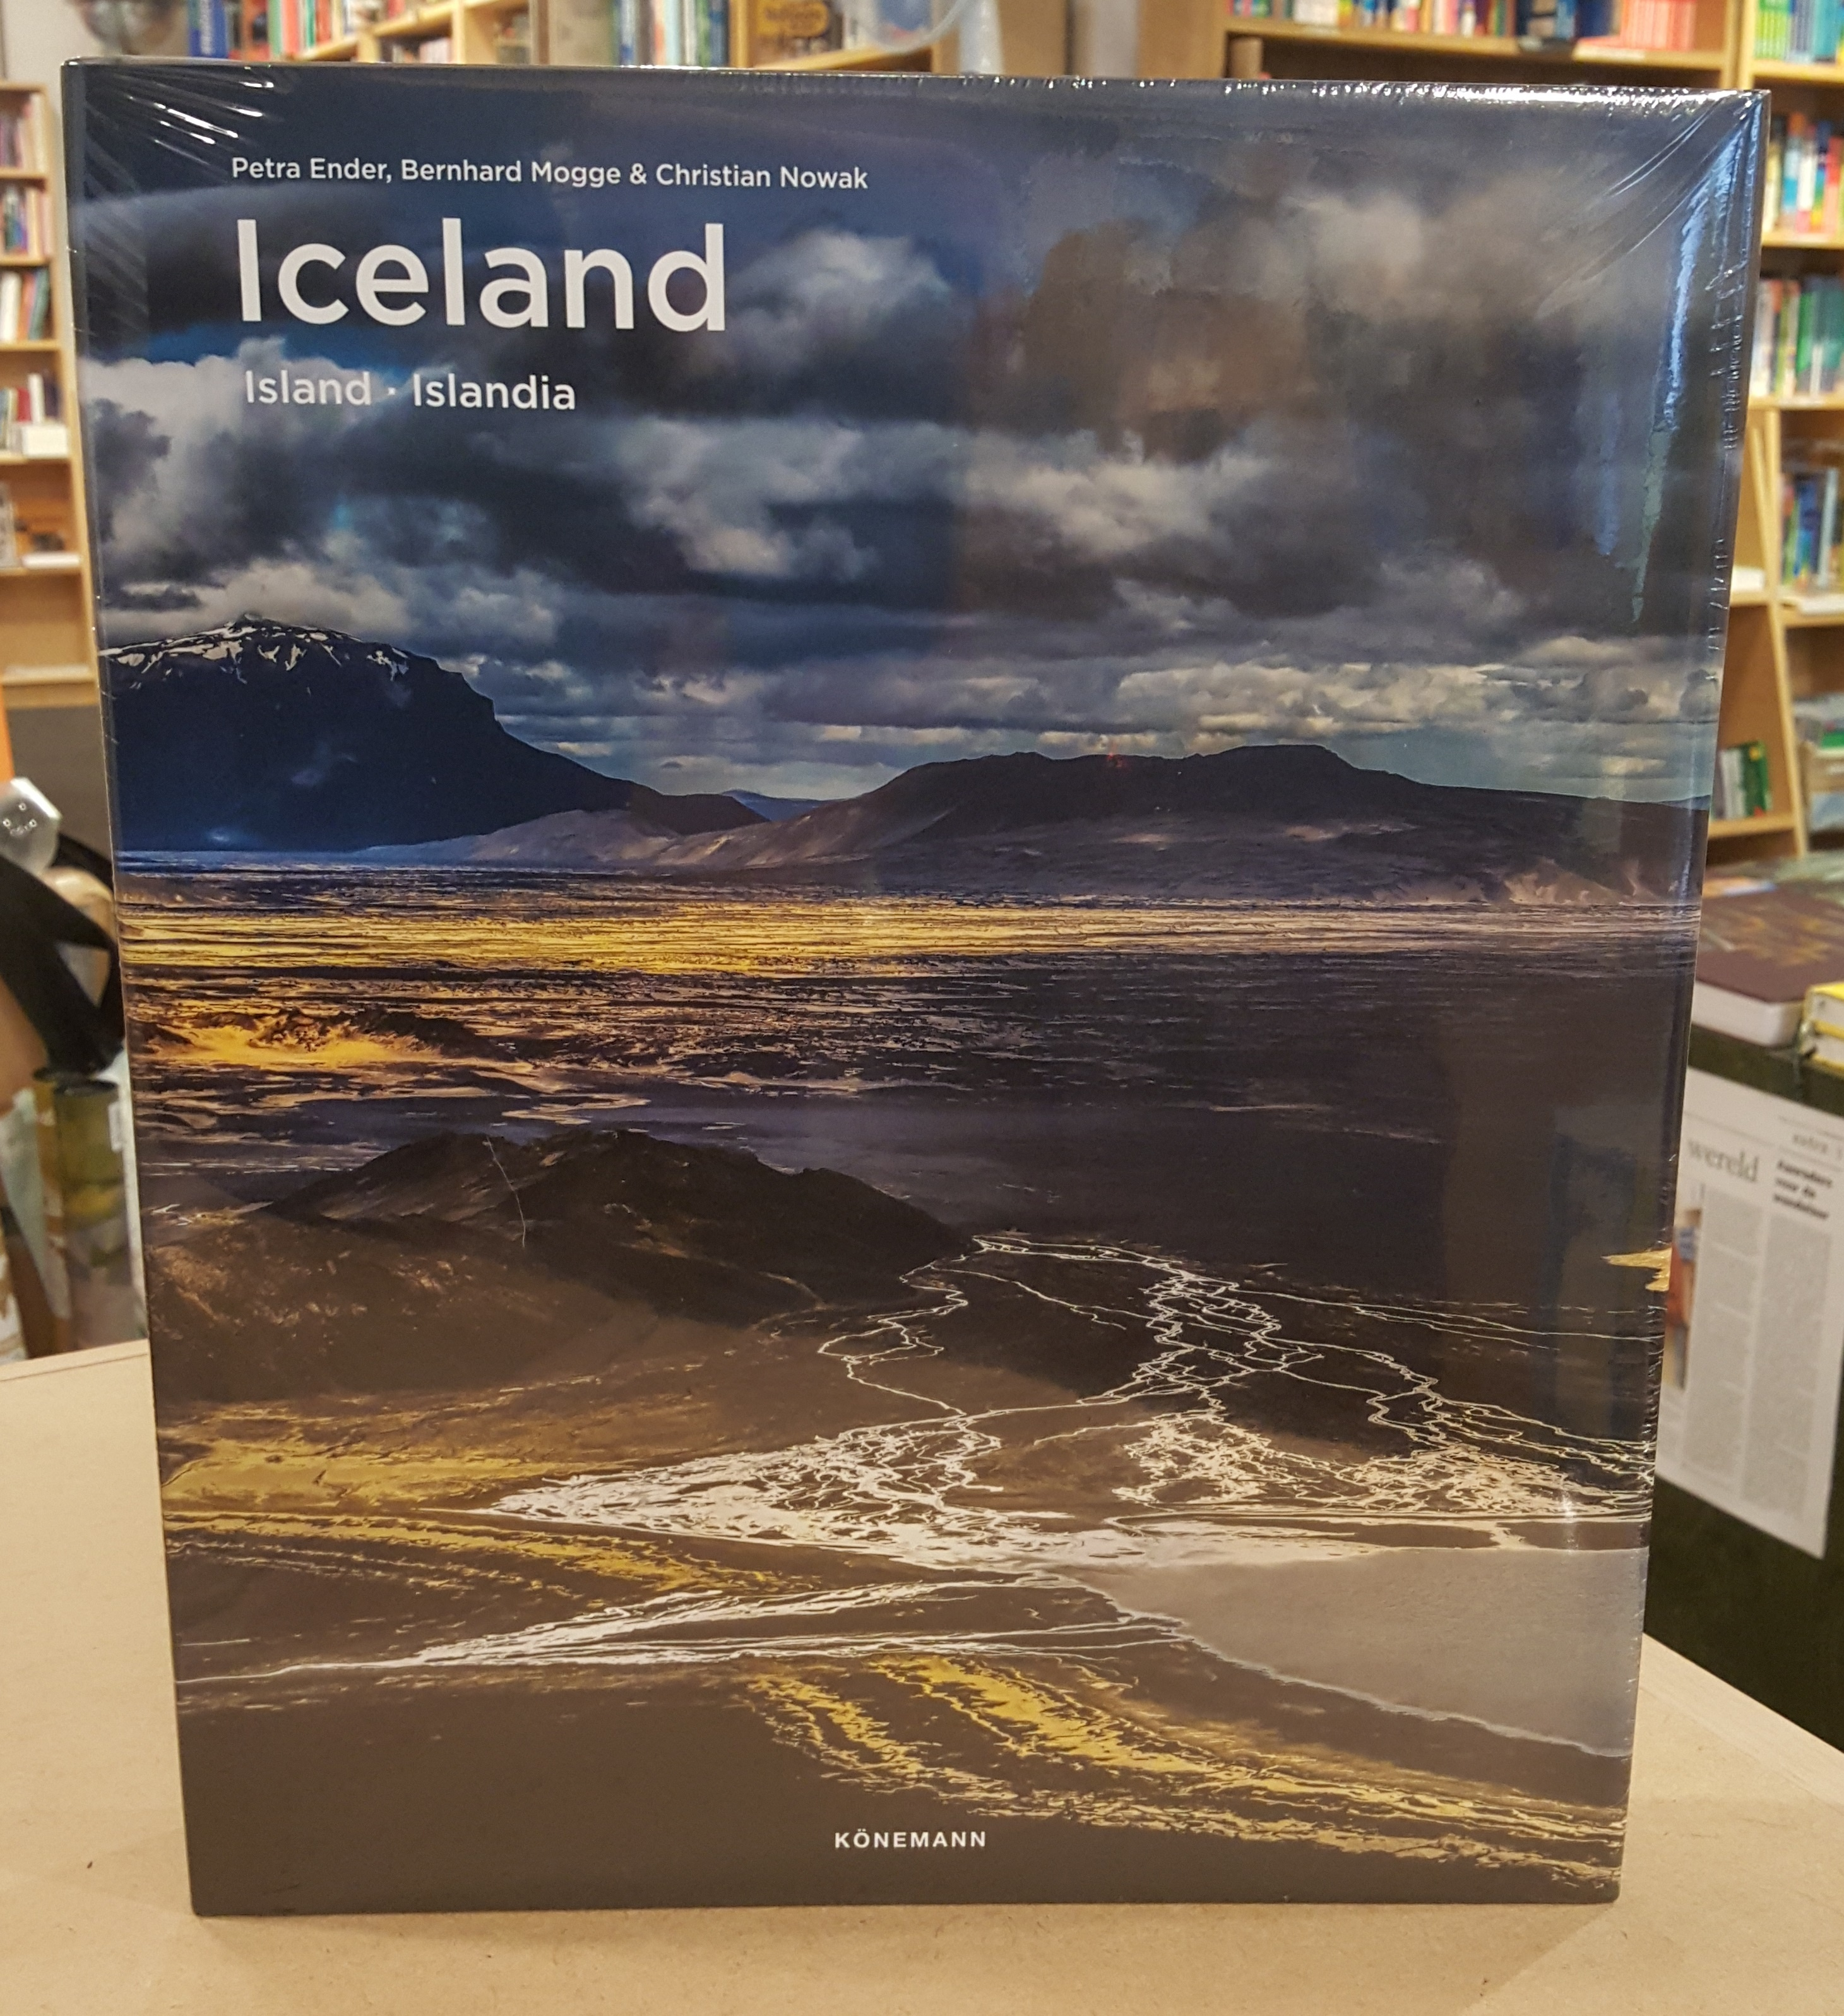 Iceland | fotoboek IJsland 9783741920226  Könemann   Fotoboeken IJsland